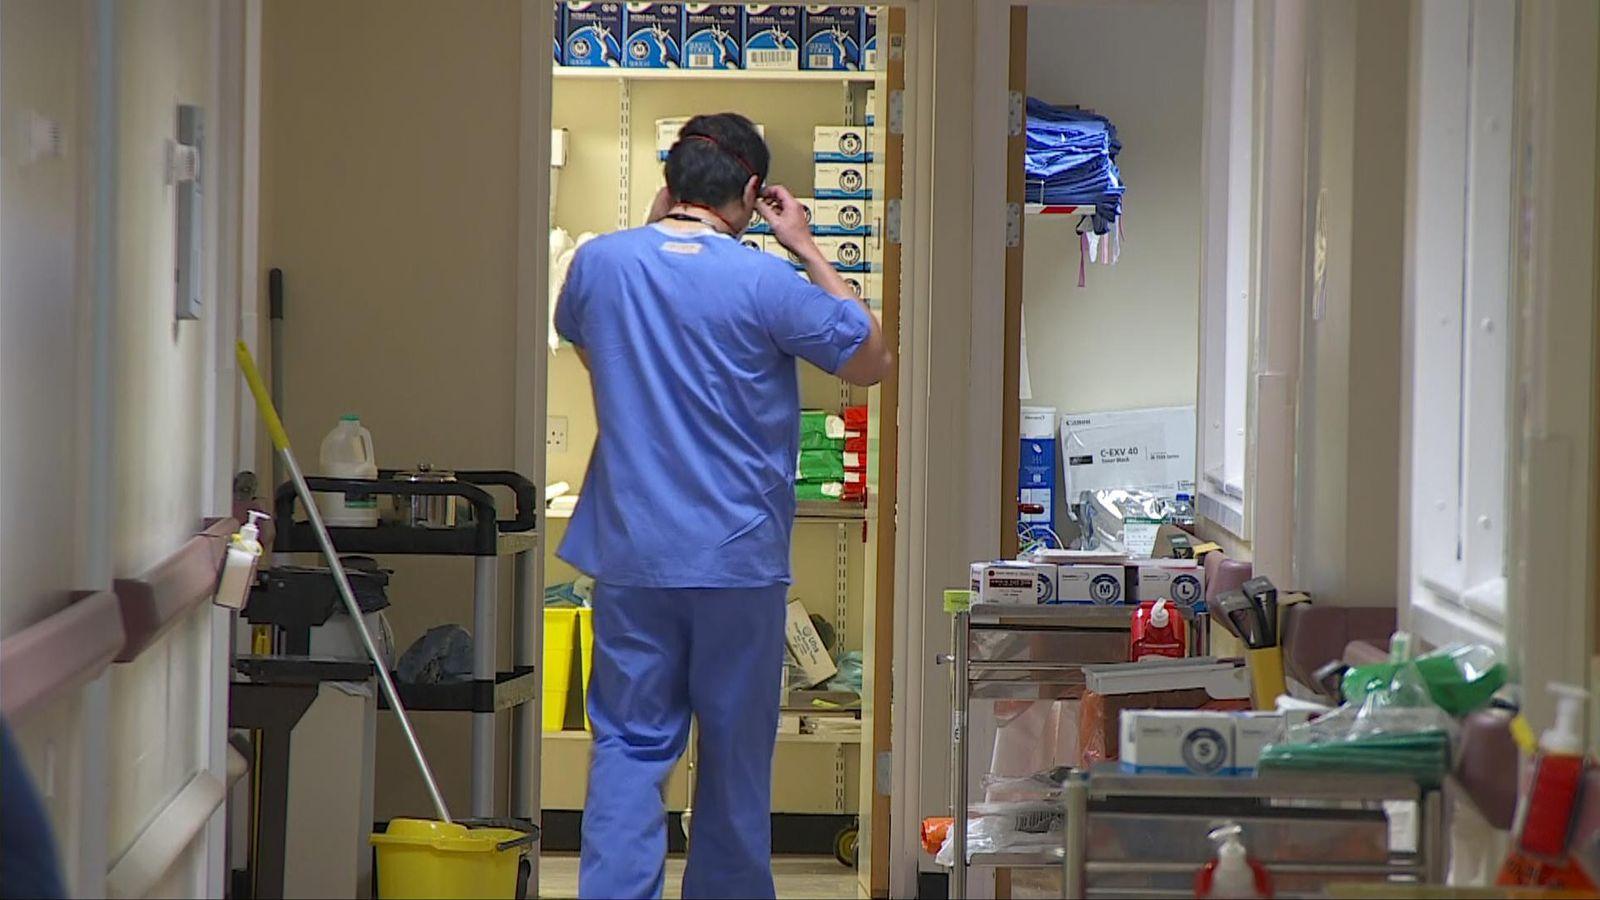 Coronavirus: First look inside British COVID-19 ward as Wales prepares for peak